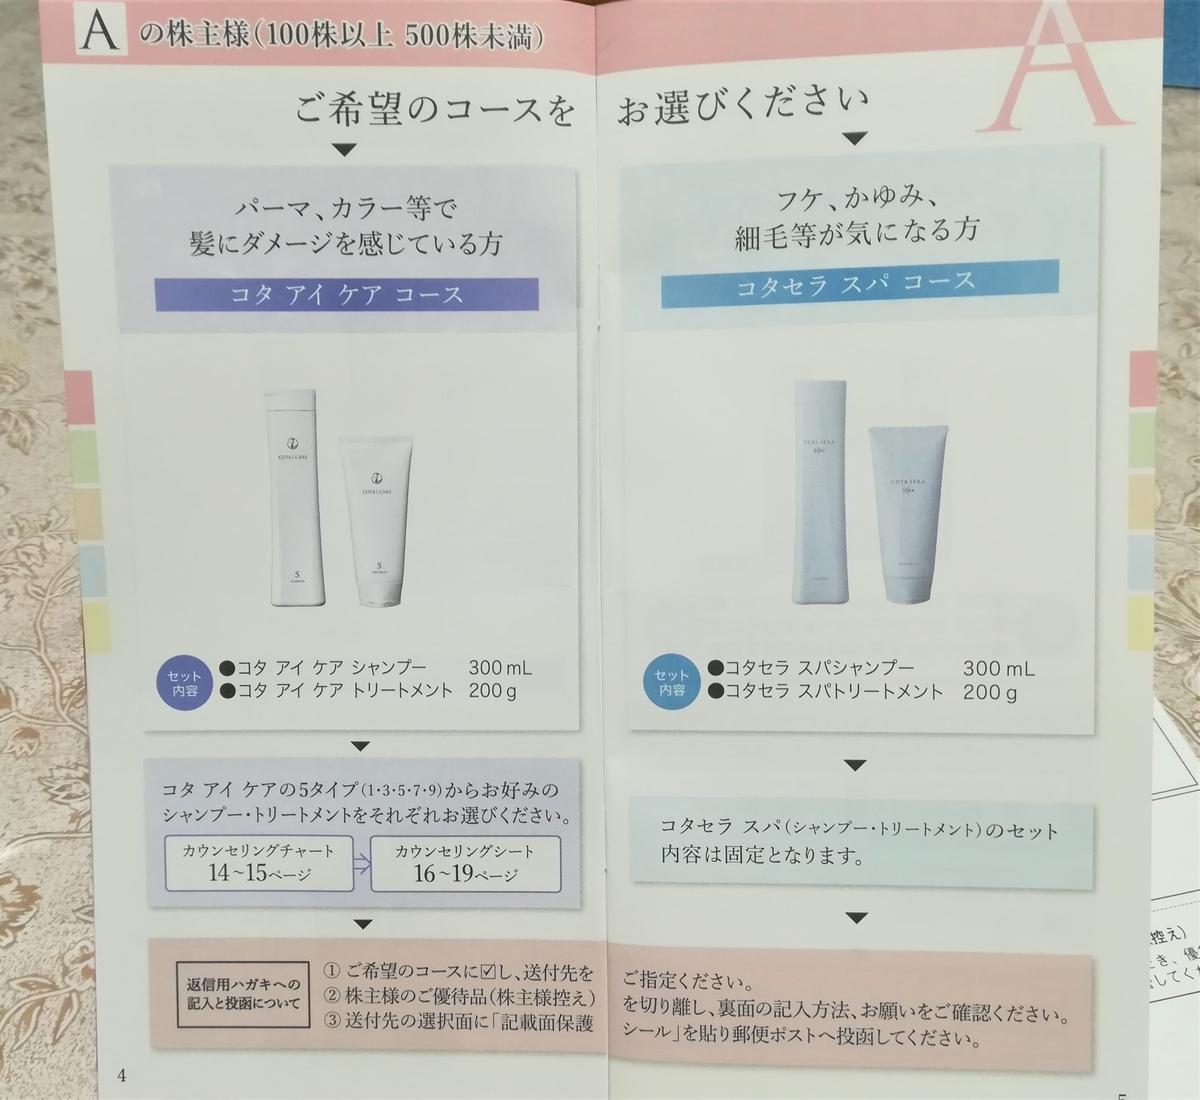 f:id:japantk:20190528101131j:plain